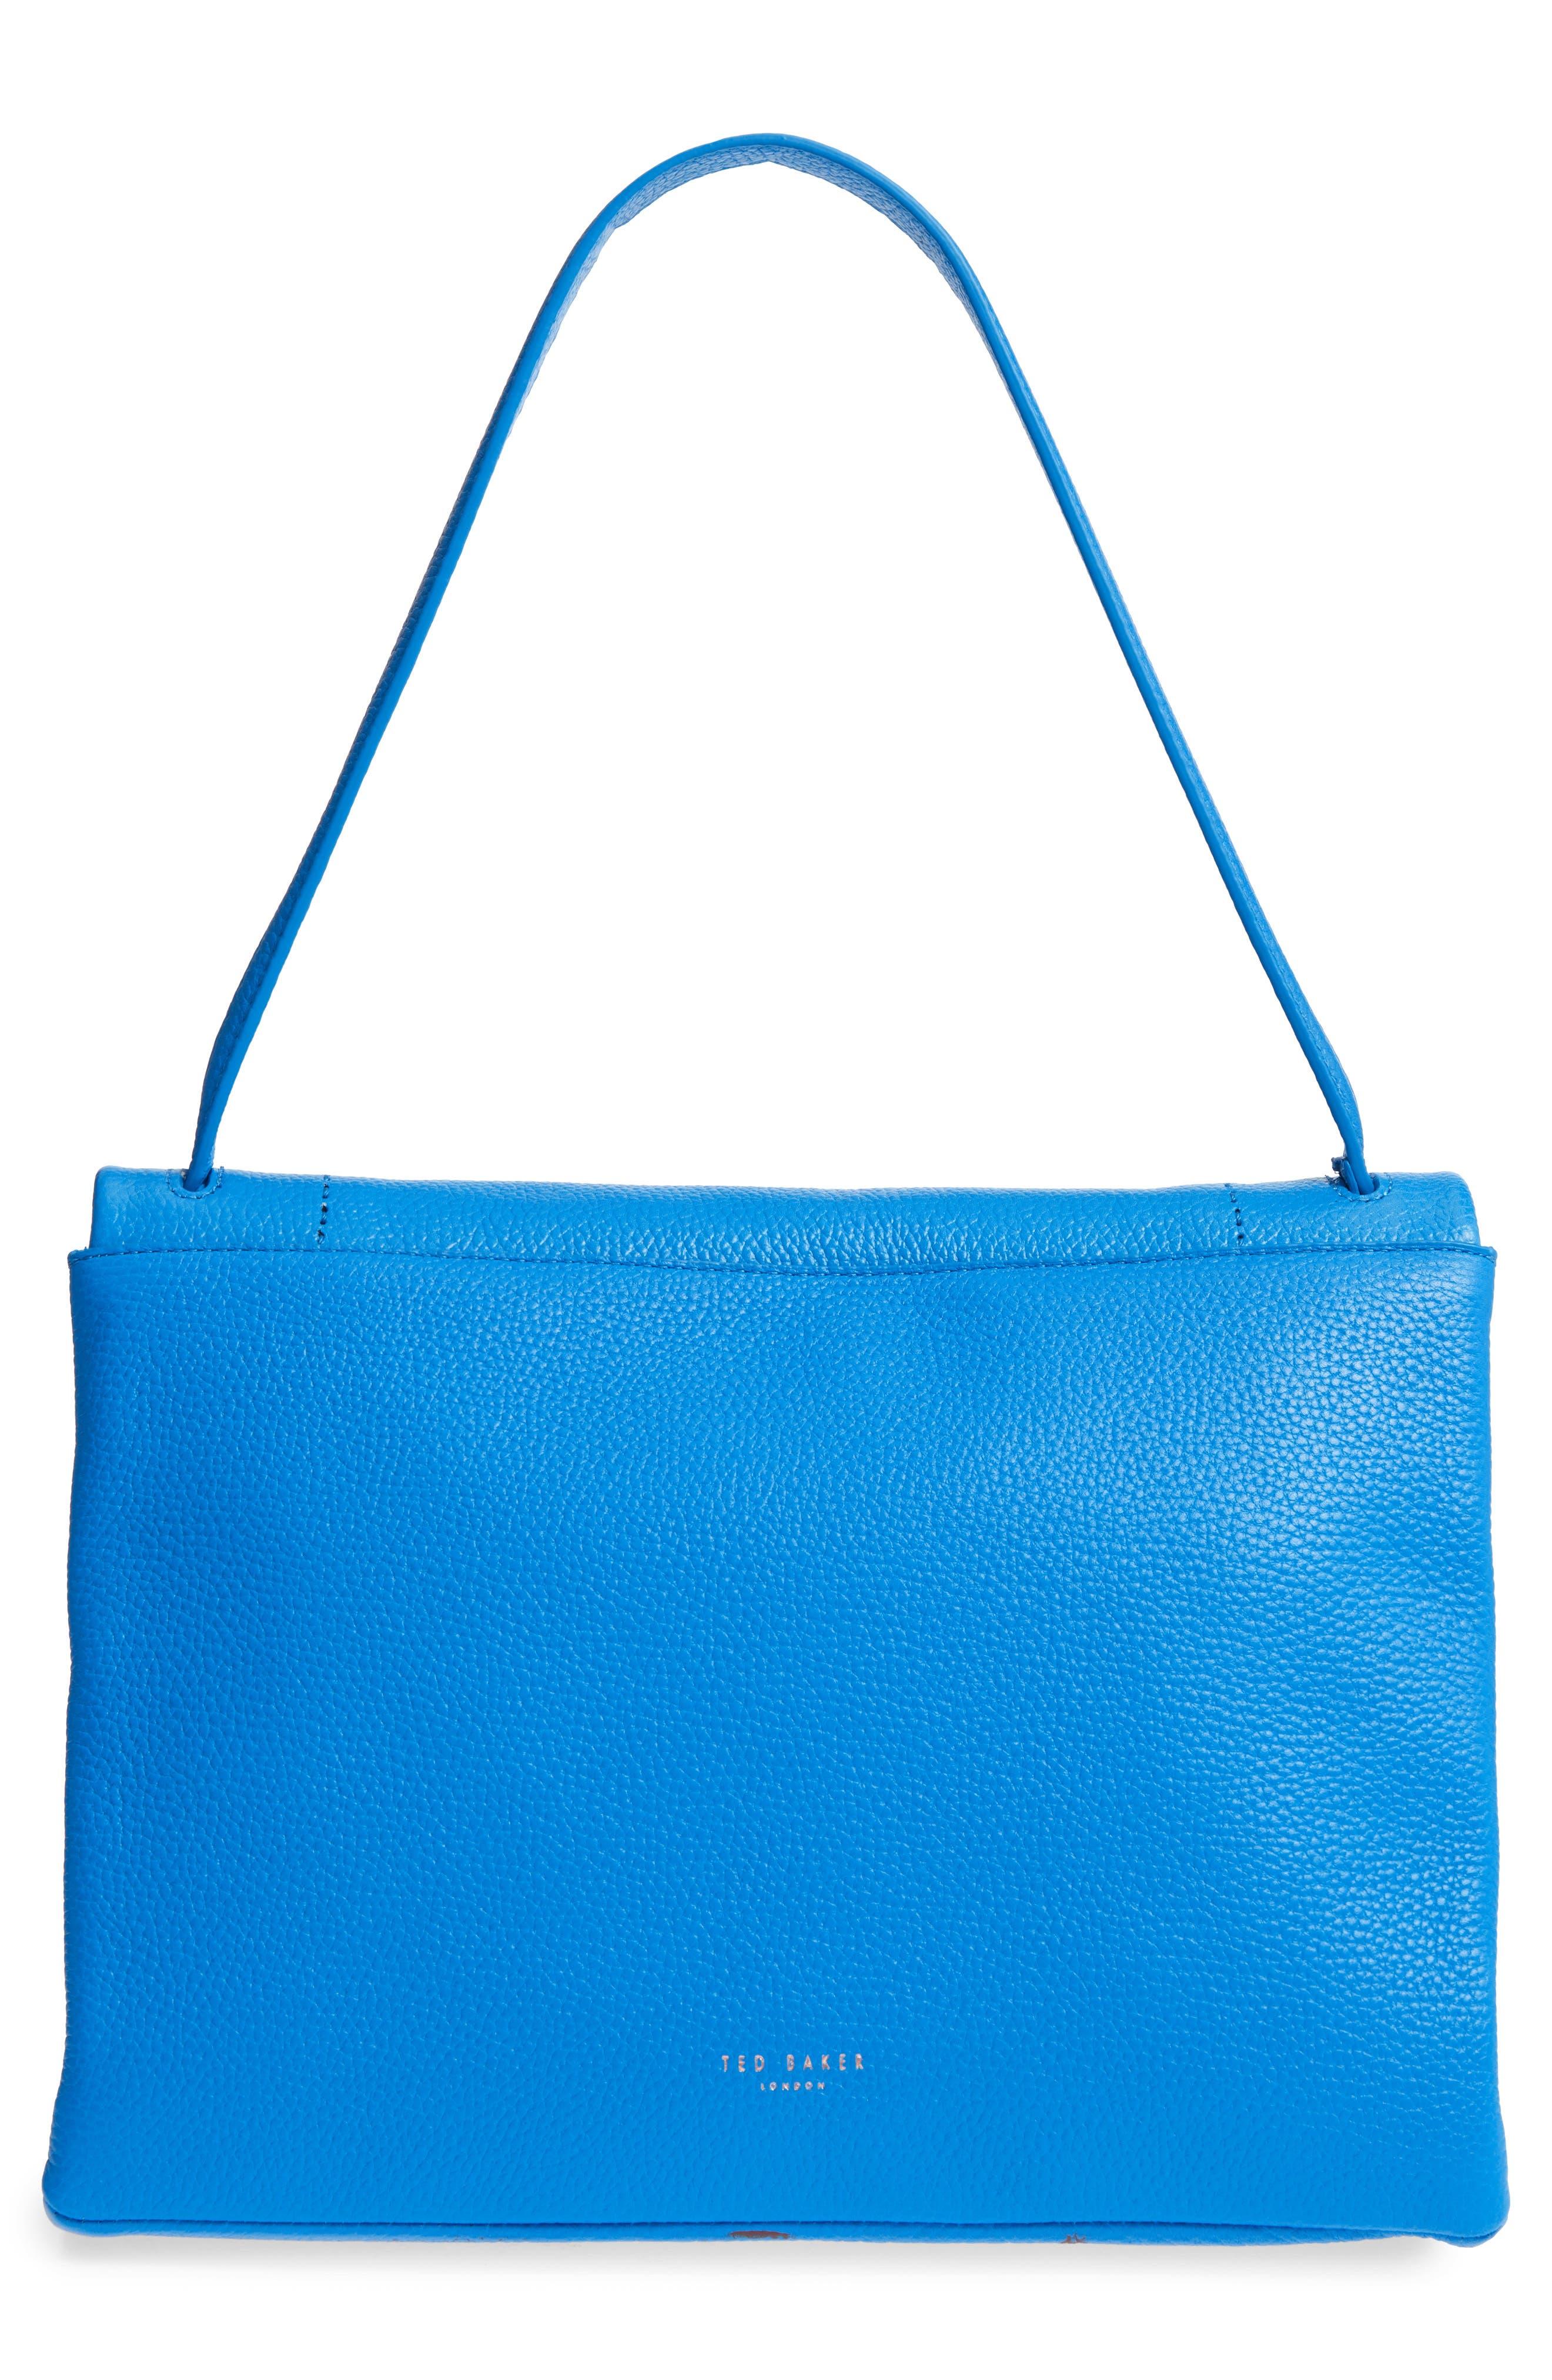 Heeidi Harmony Print Leather Shoulder Bag,                             Alternate thumbnail 3, color,                             Bright Blue